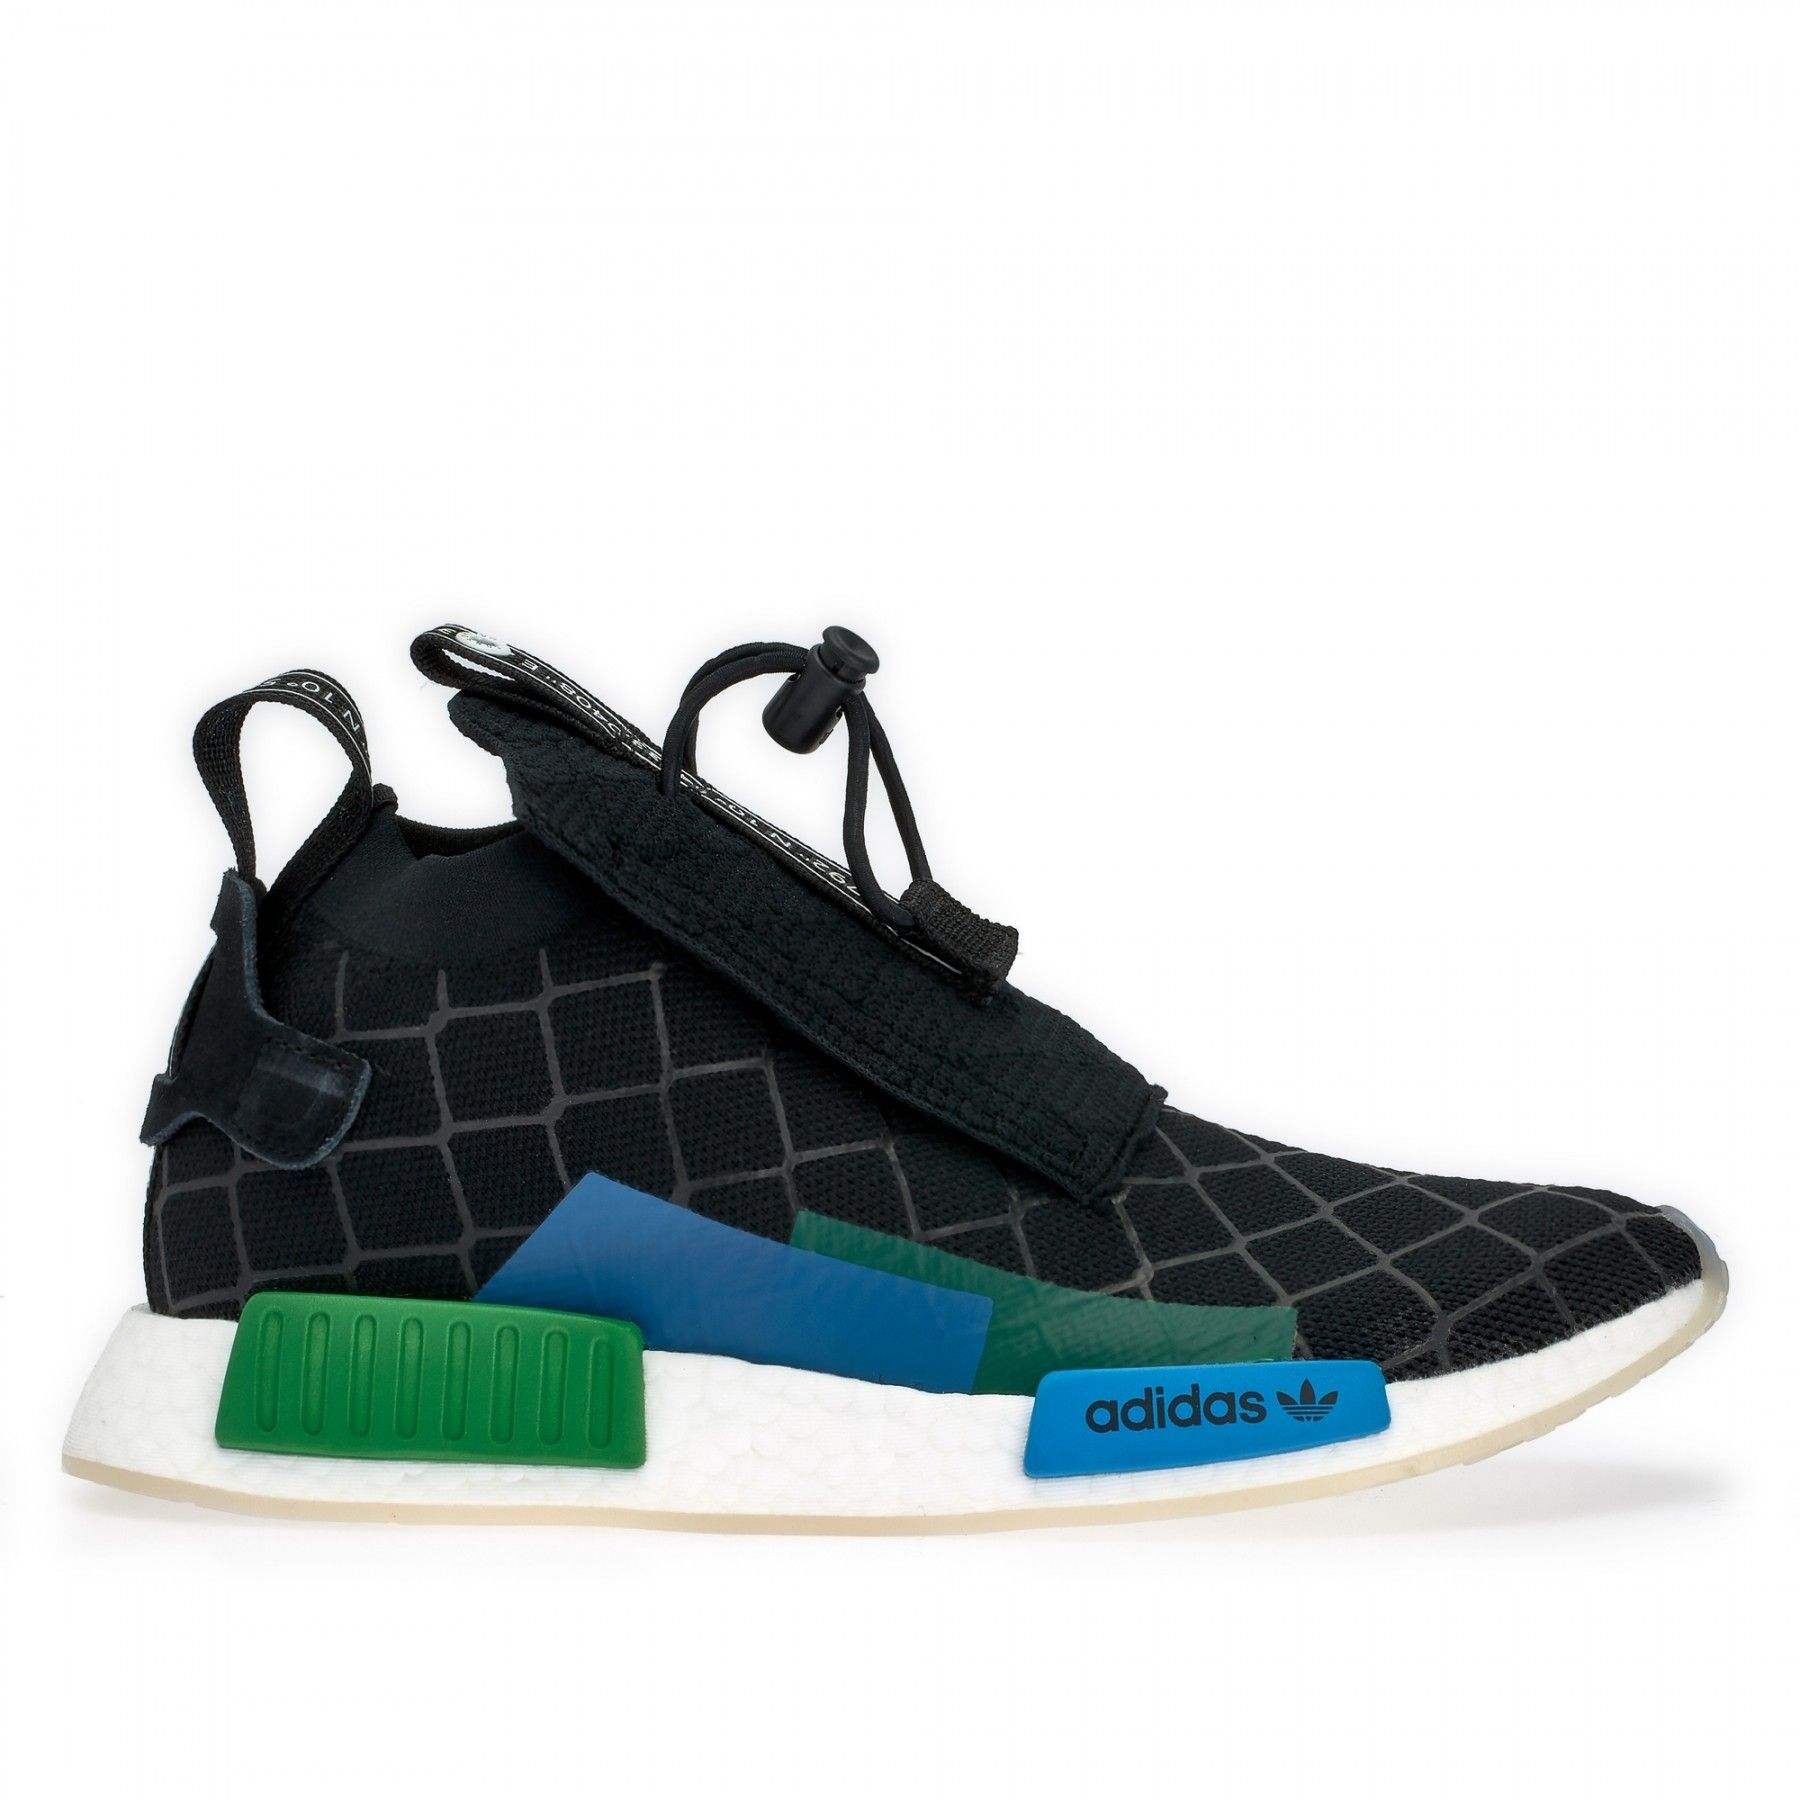 2cbcf1a0899d2 Adidas Consortium NMD R1 STLT MITA (Black)